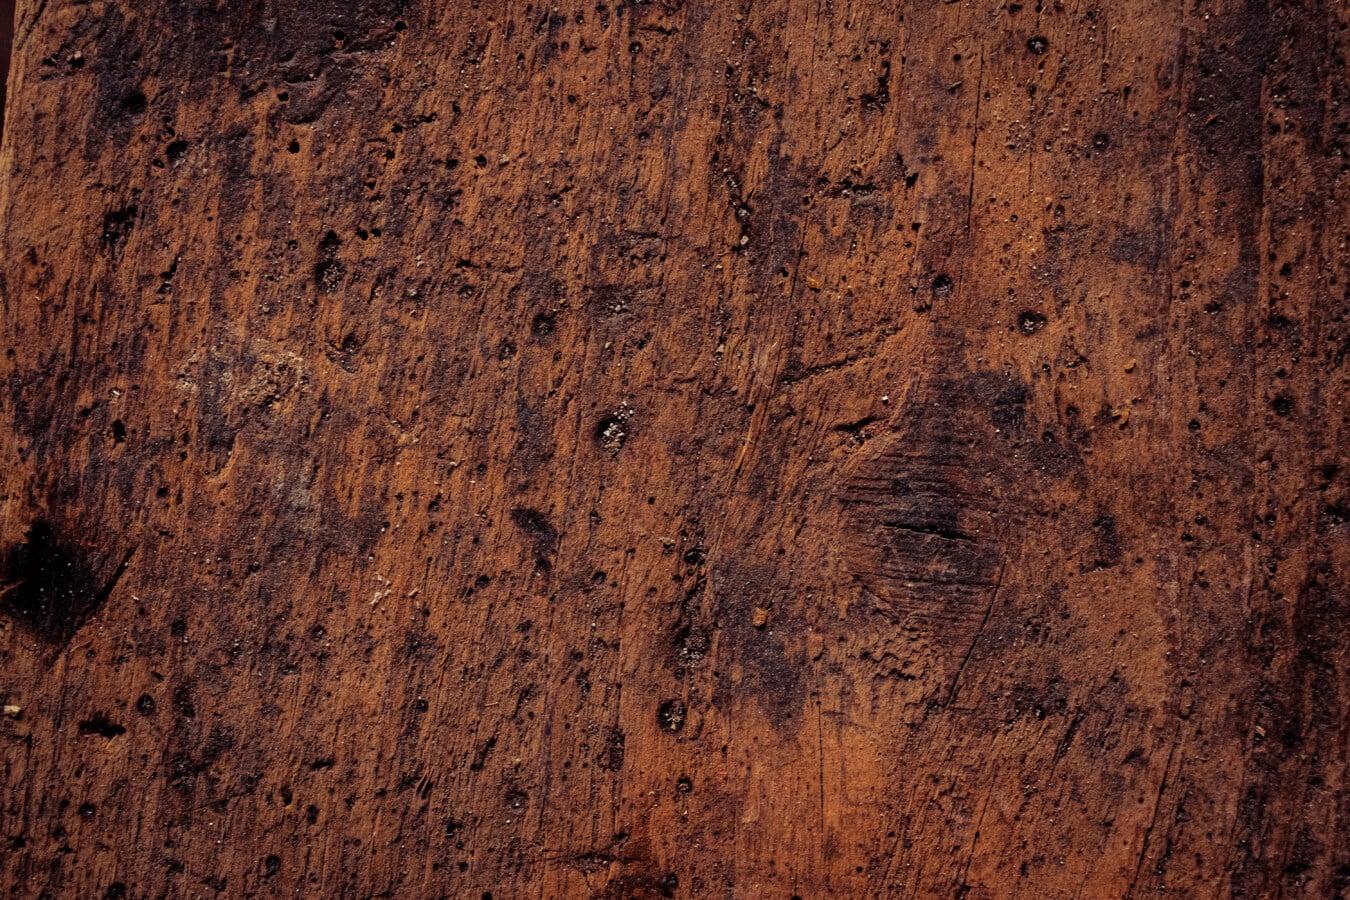 Sägemehl, Plank, aus Holz, Detail, Fleck, Tischlerei, Oberfläche, Knot, Antik, leere